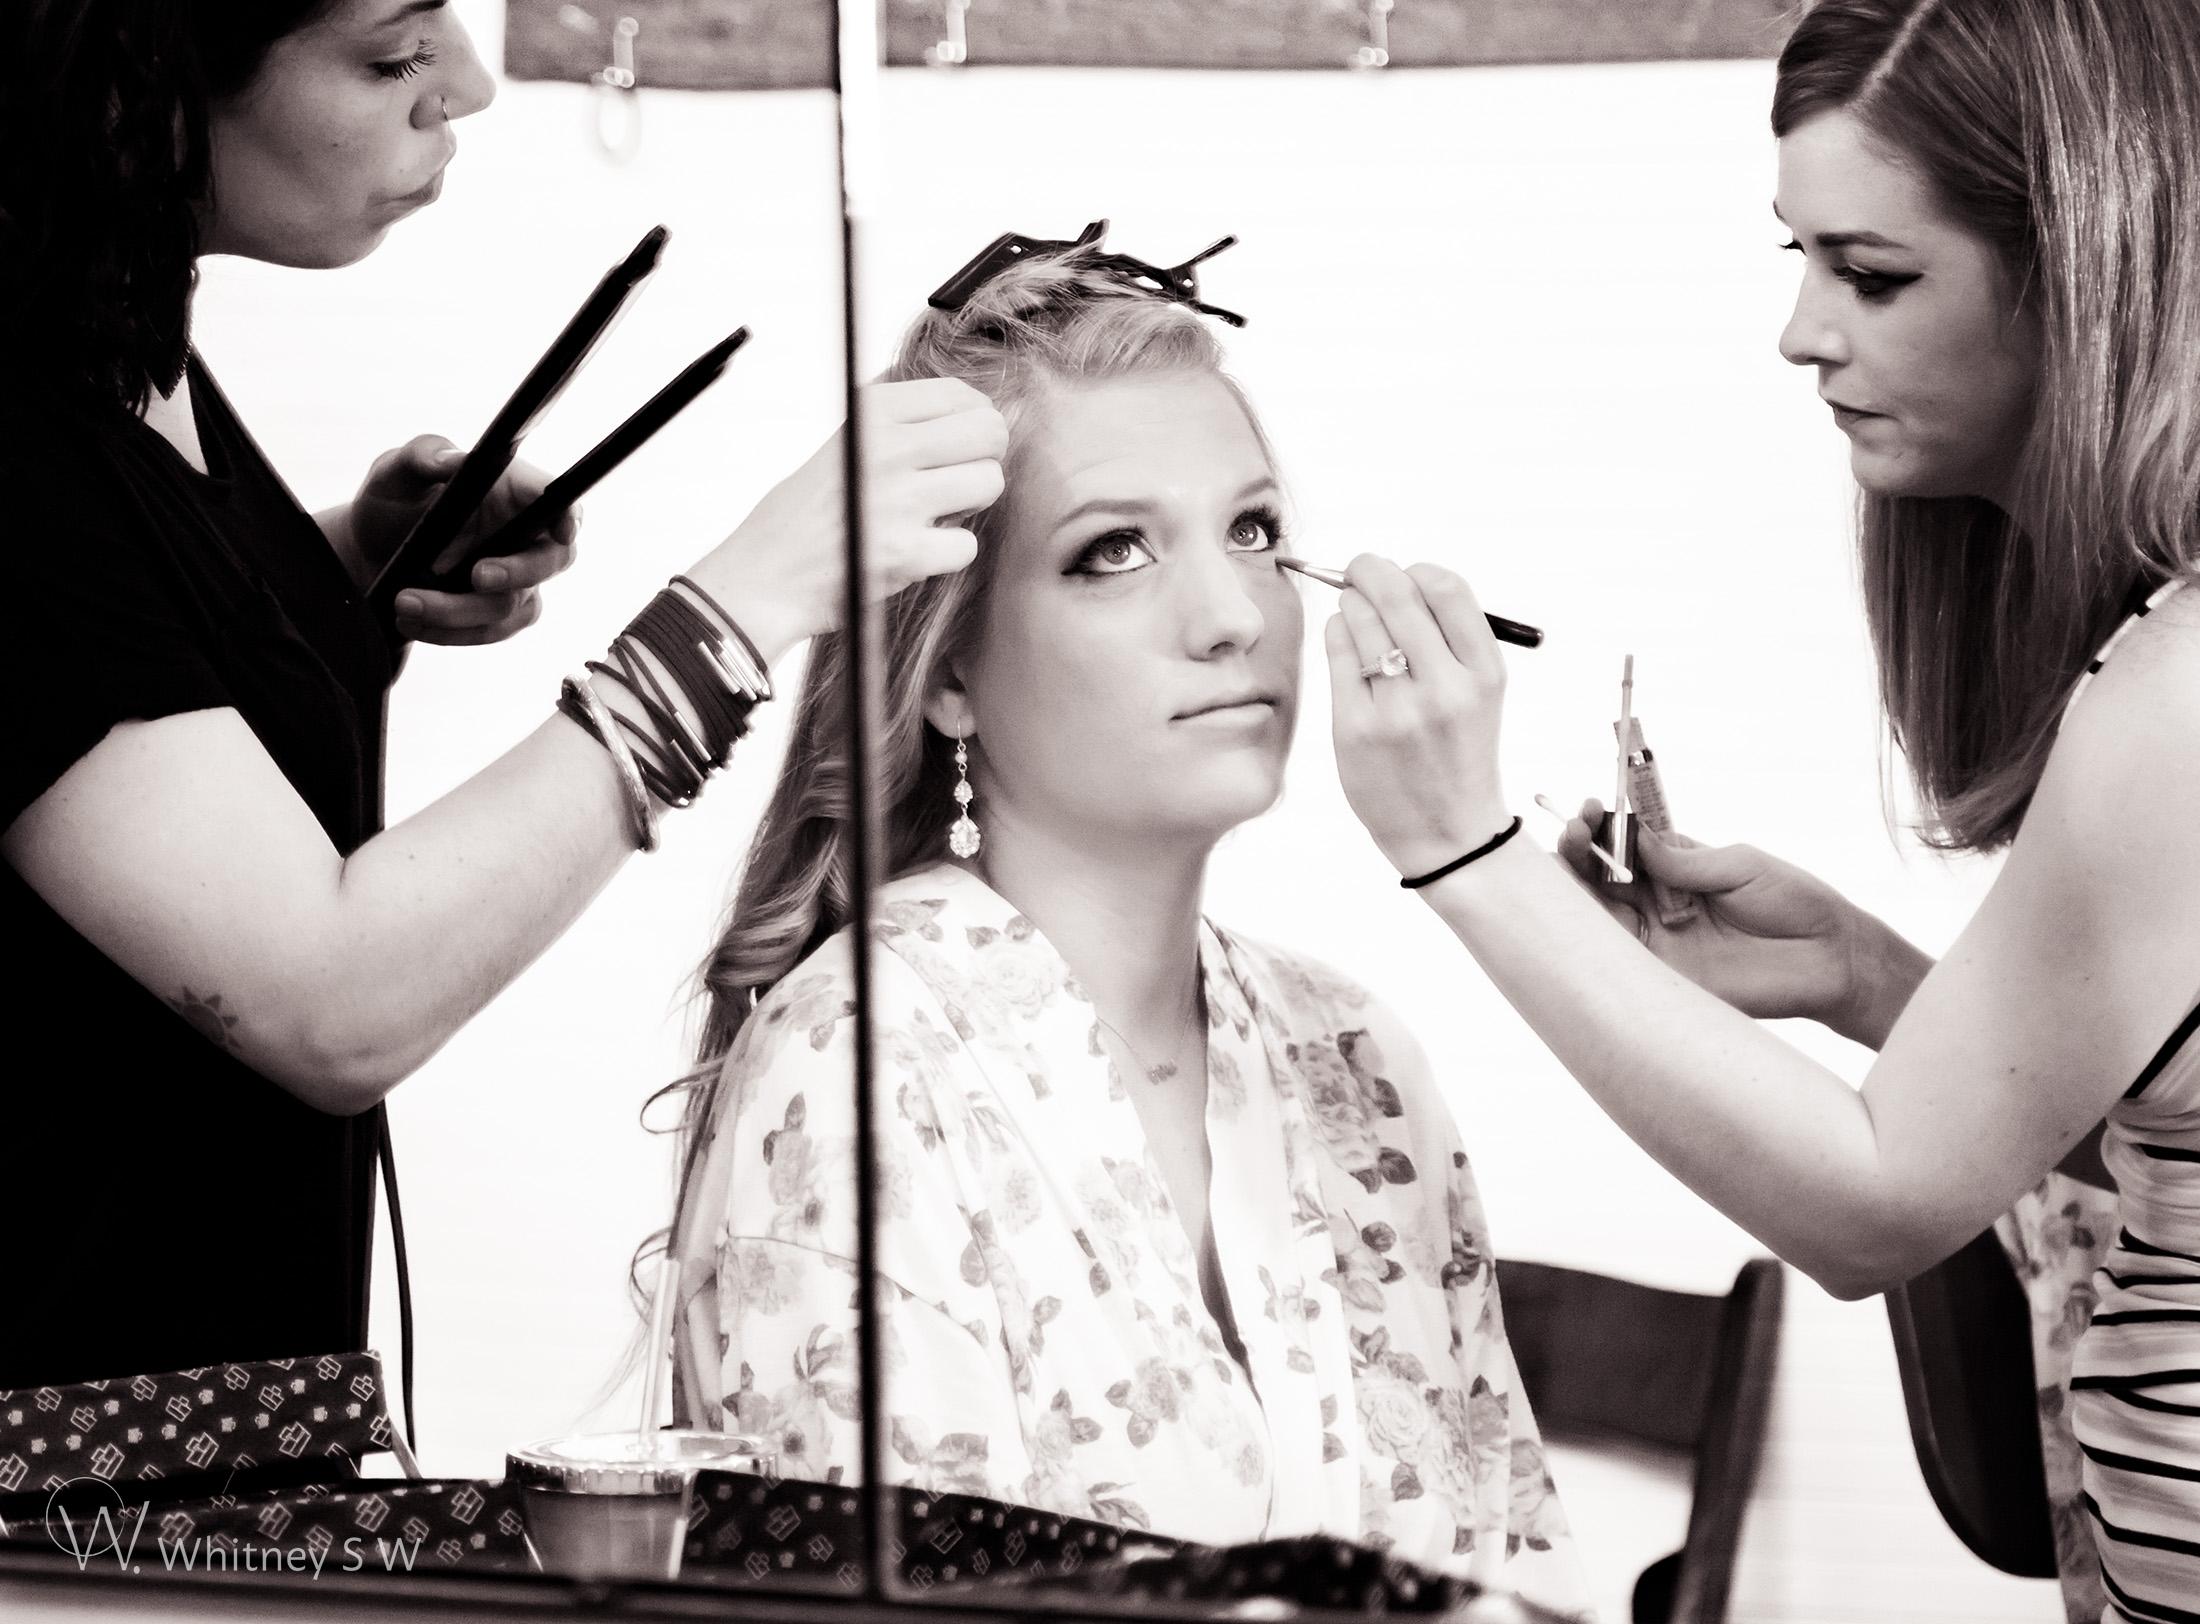 Morgan & Kaivon Wedding - Photography by Whitney S Williams whitneysw (18).jpg